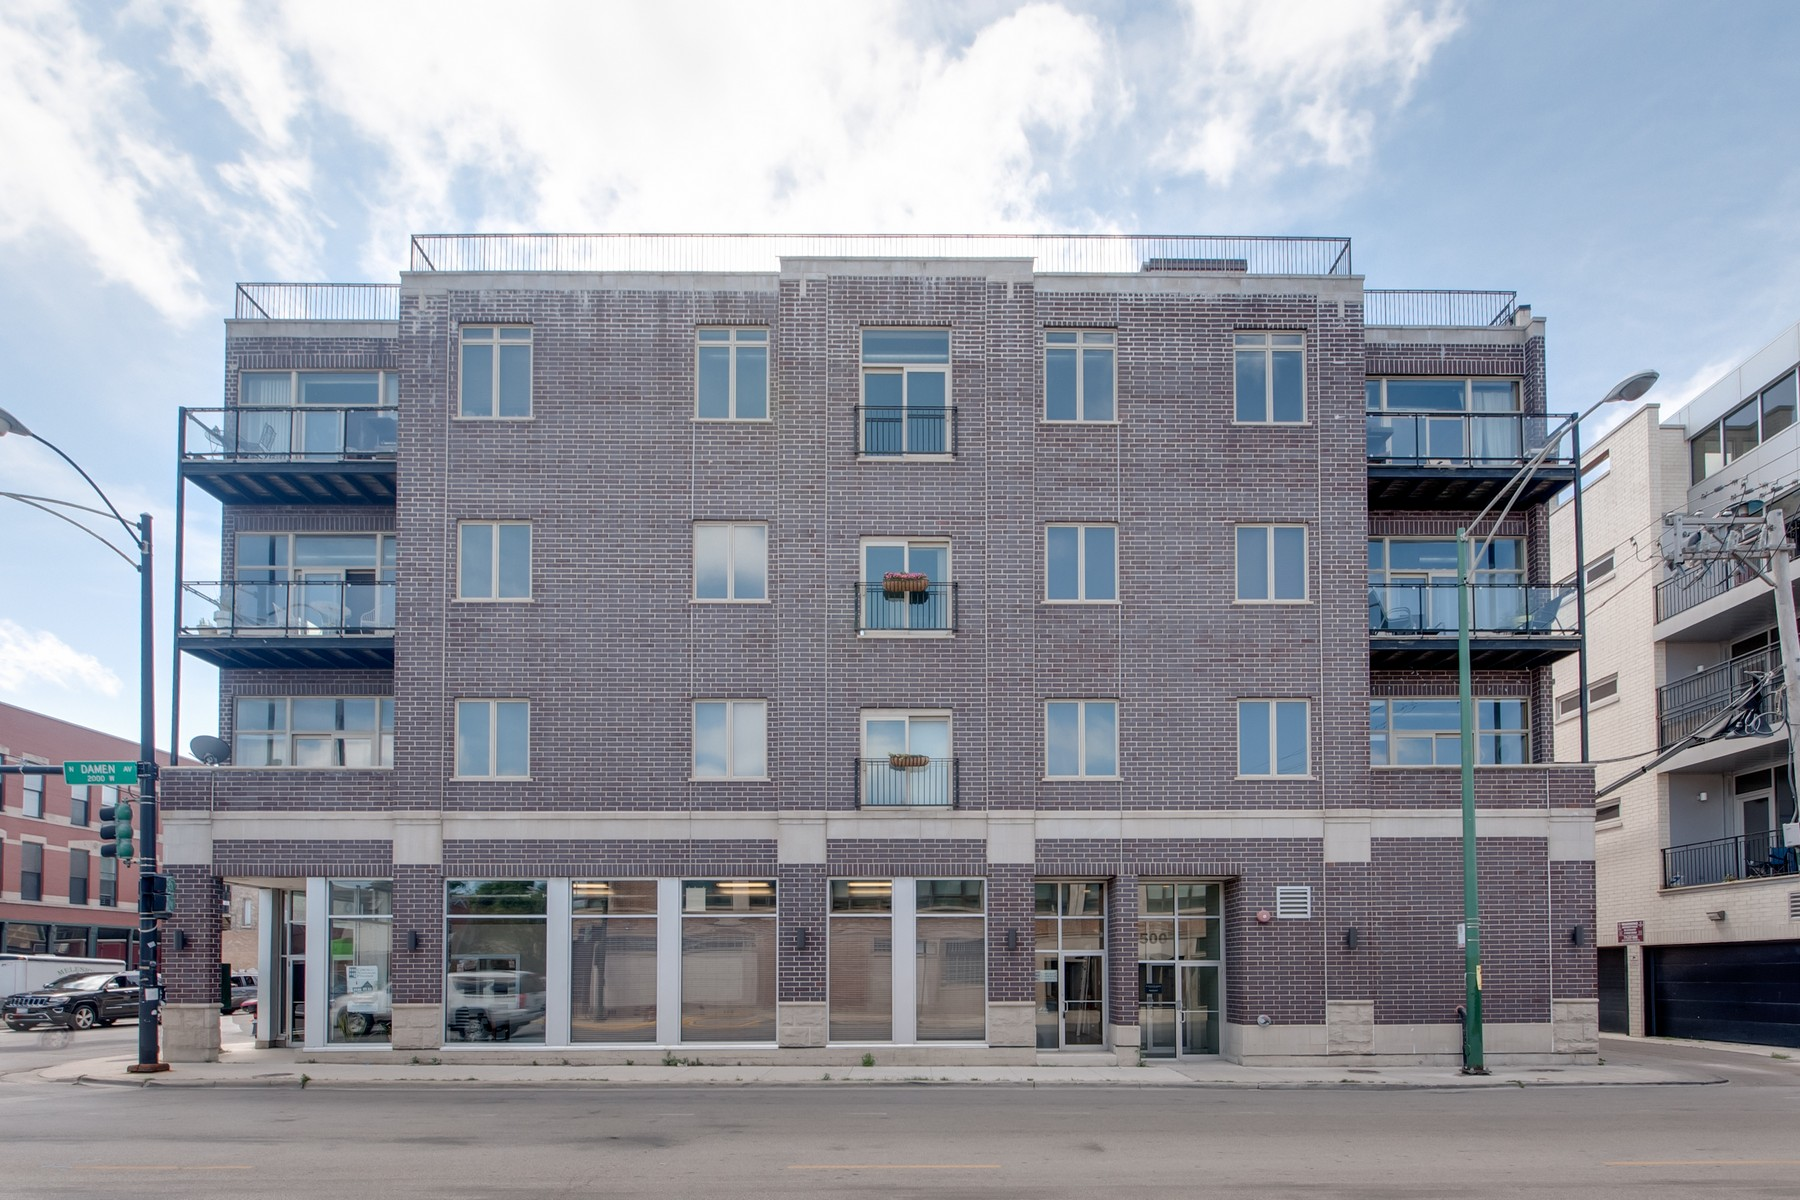 Condominium for Sale at Grand Timber Lofts 500 N Damen Avenue Unit 203 Ukranian Village, Chicago, Illinois, 60622 United States